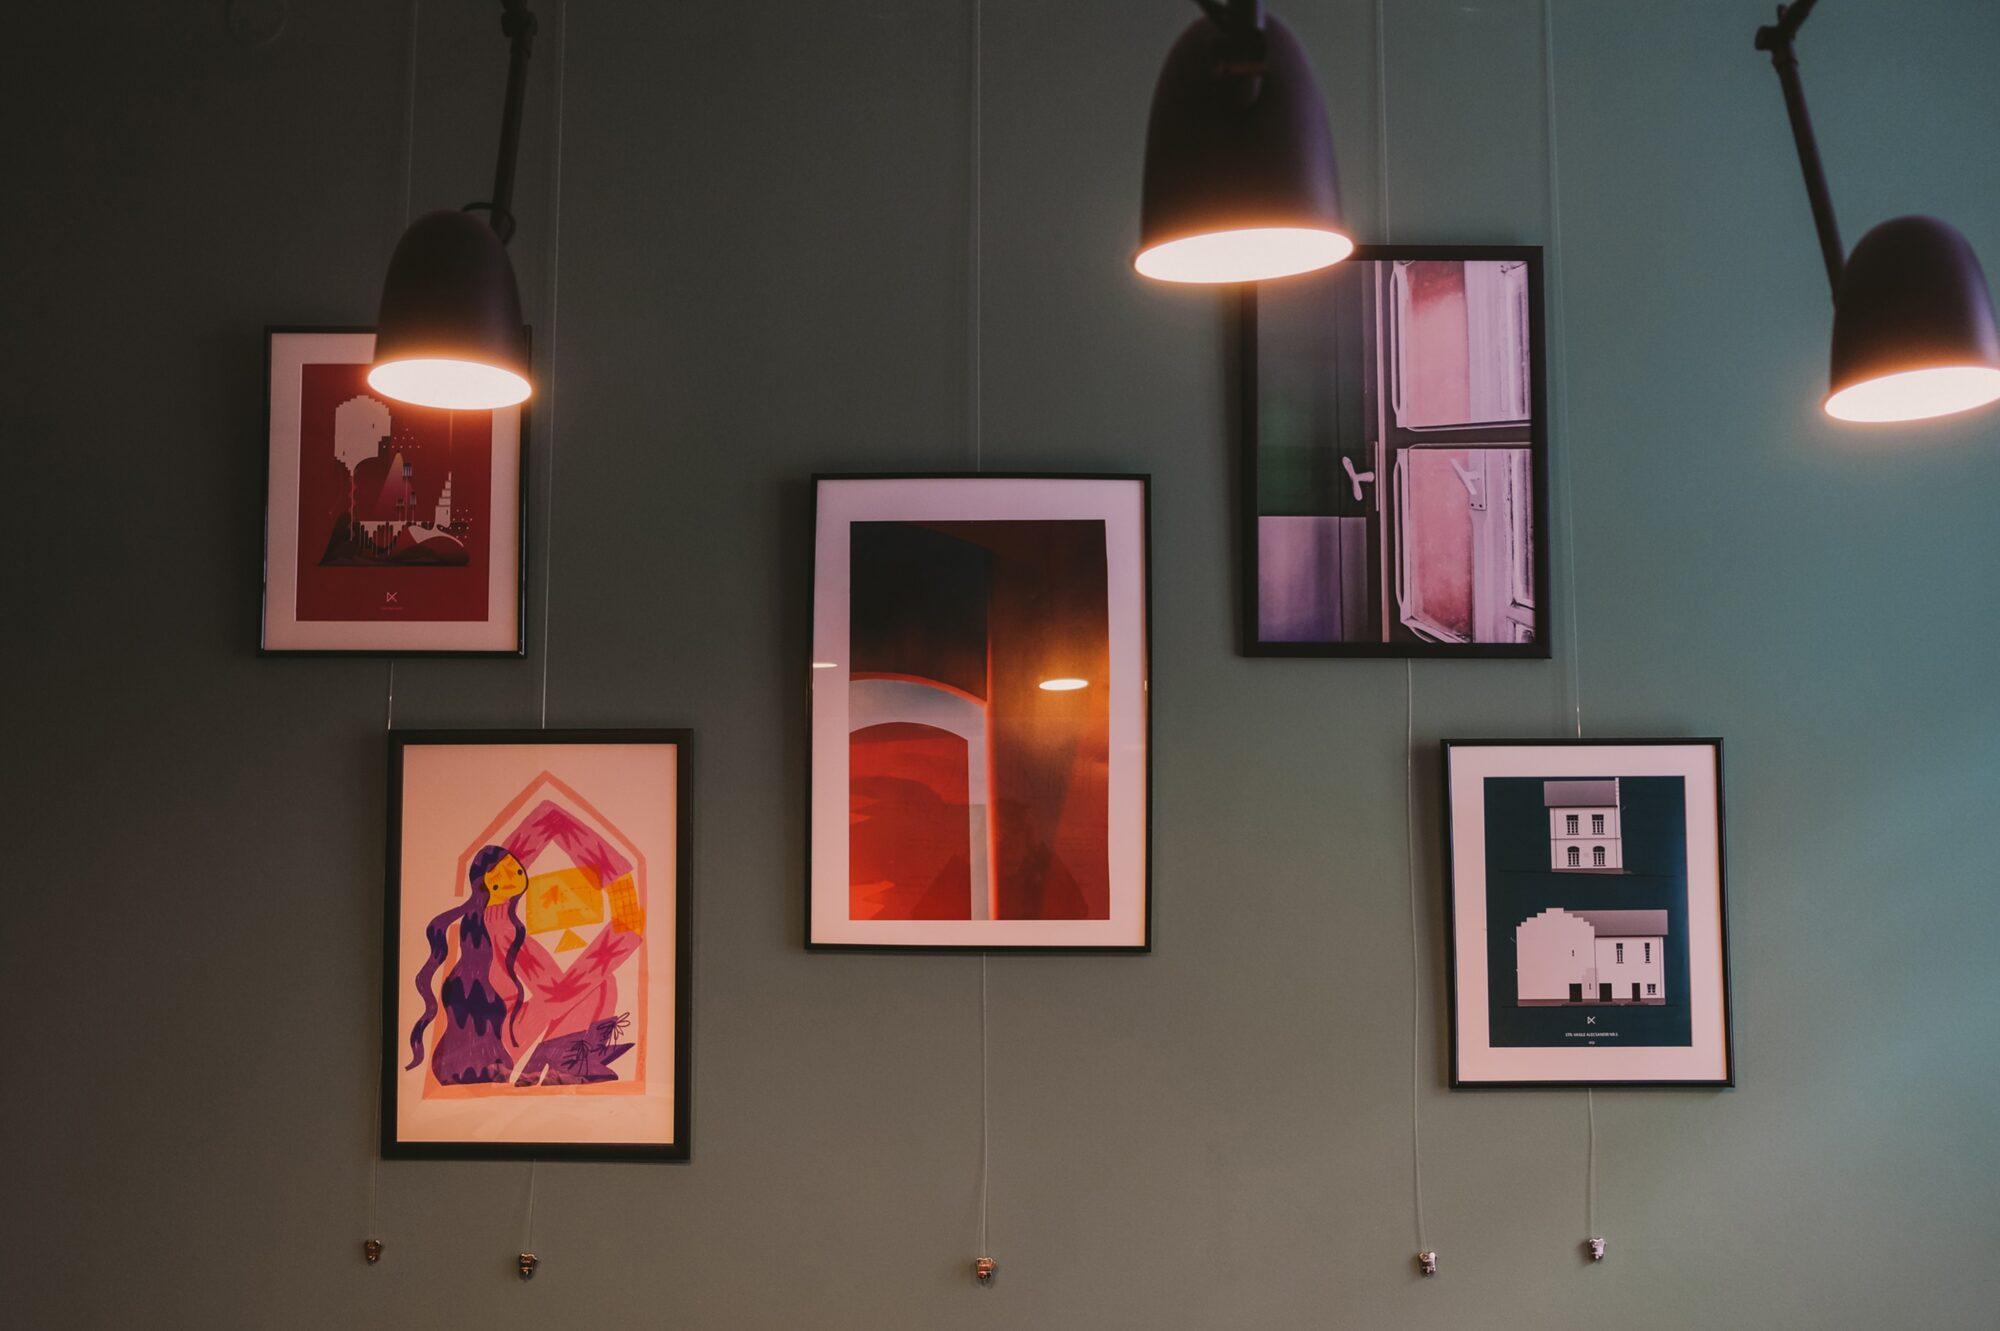 Wall of art at Pixelgrade's headquarters